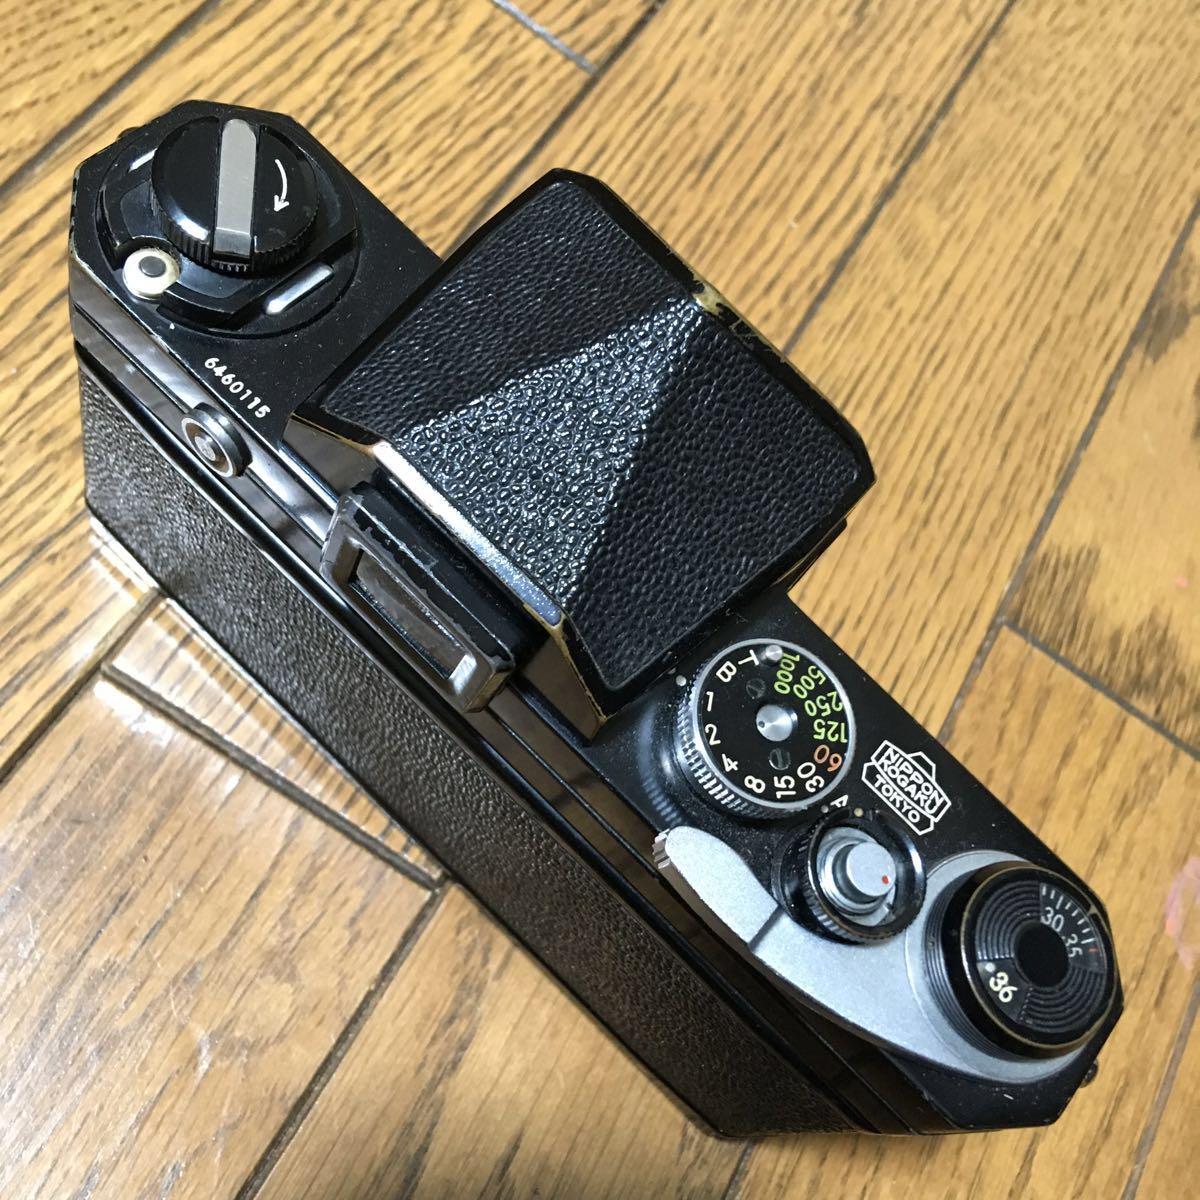 Nikon F アイレベル ブラック ボディ 646万台 前期型 動作確認済みです。_画像4